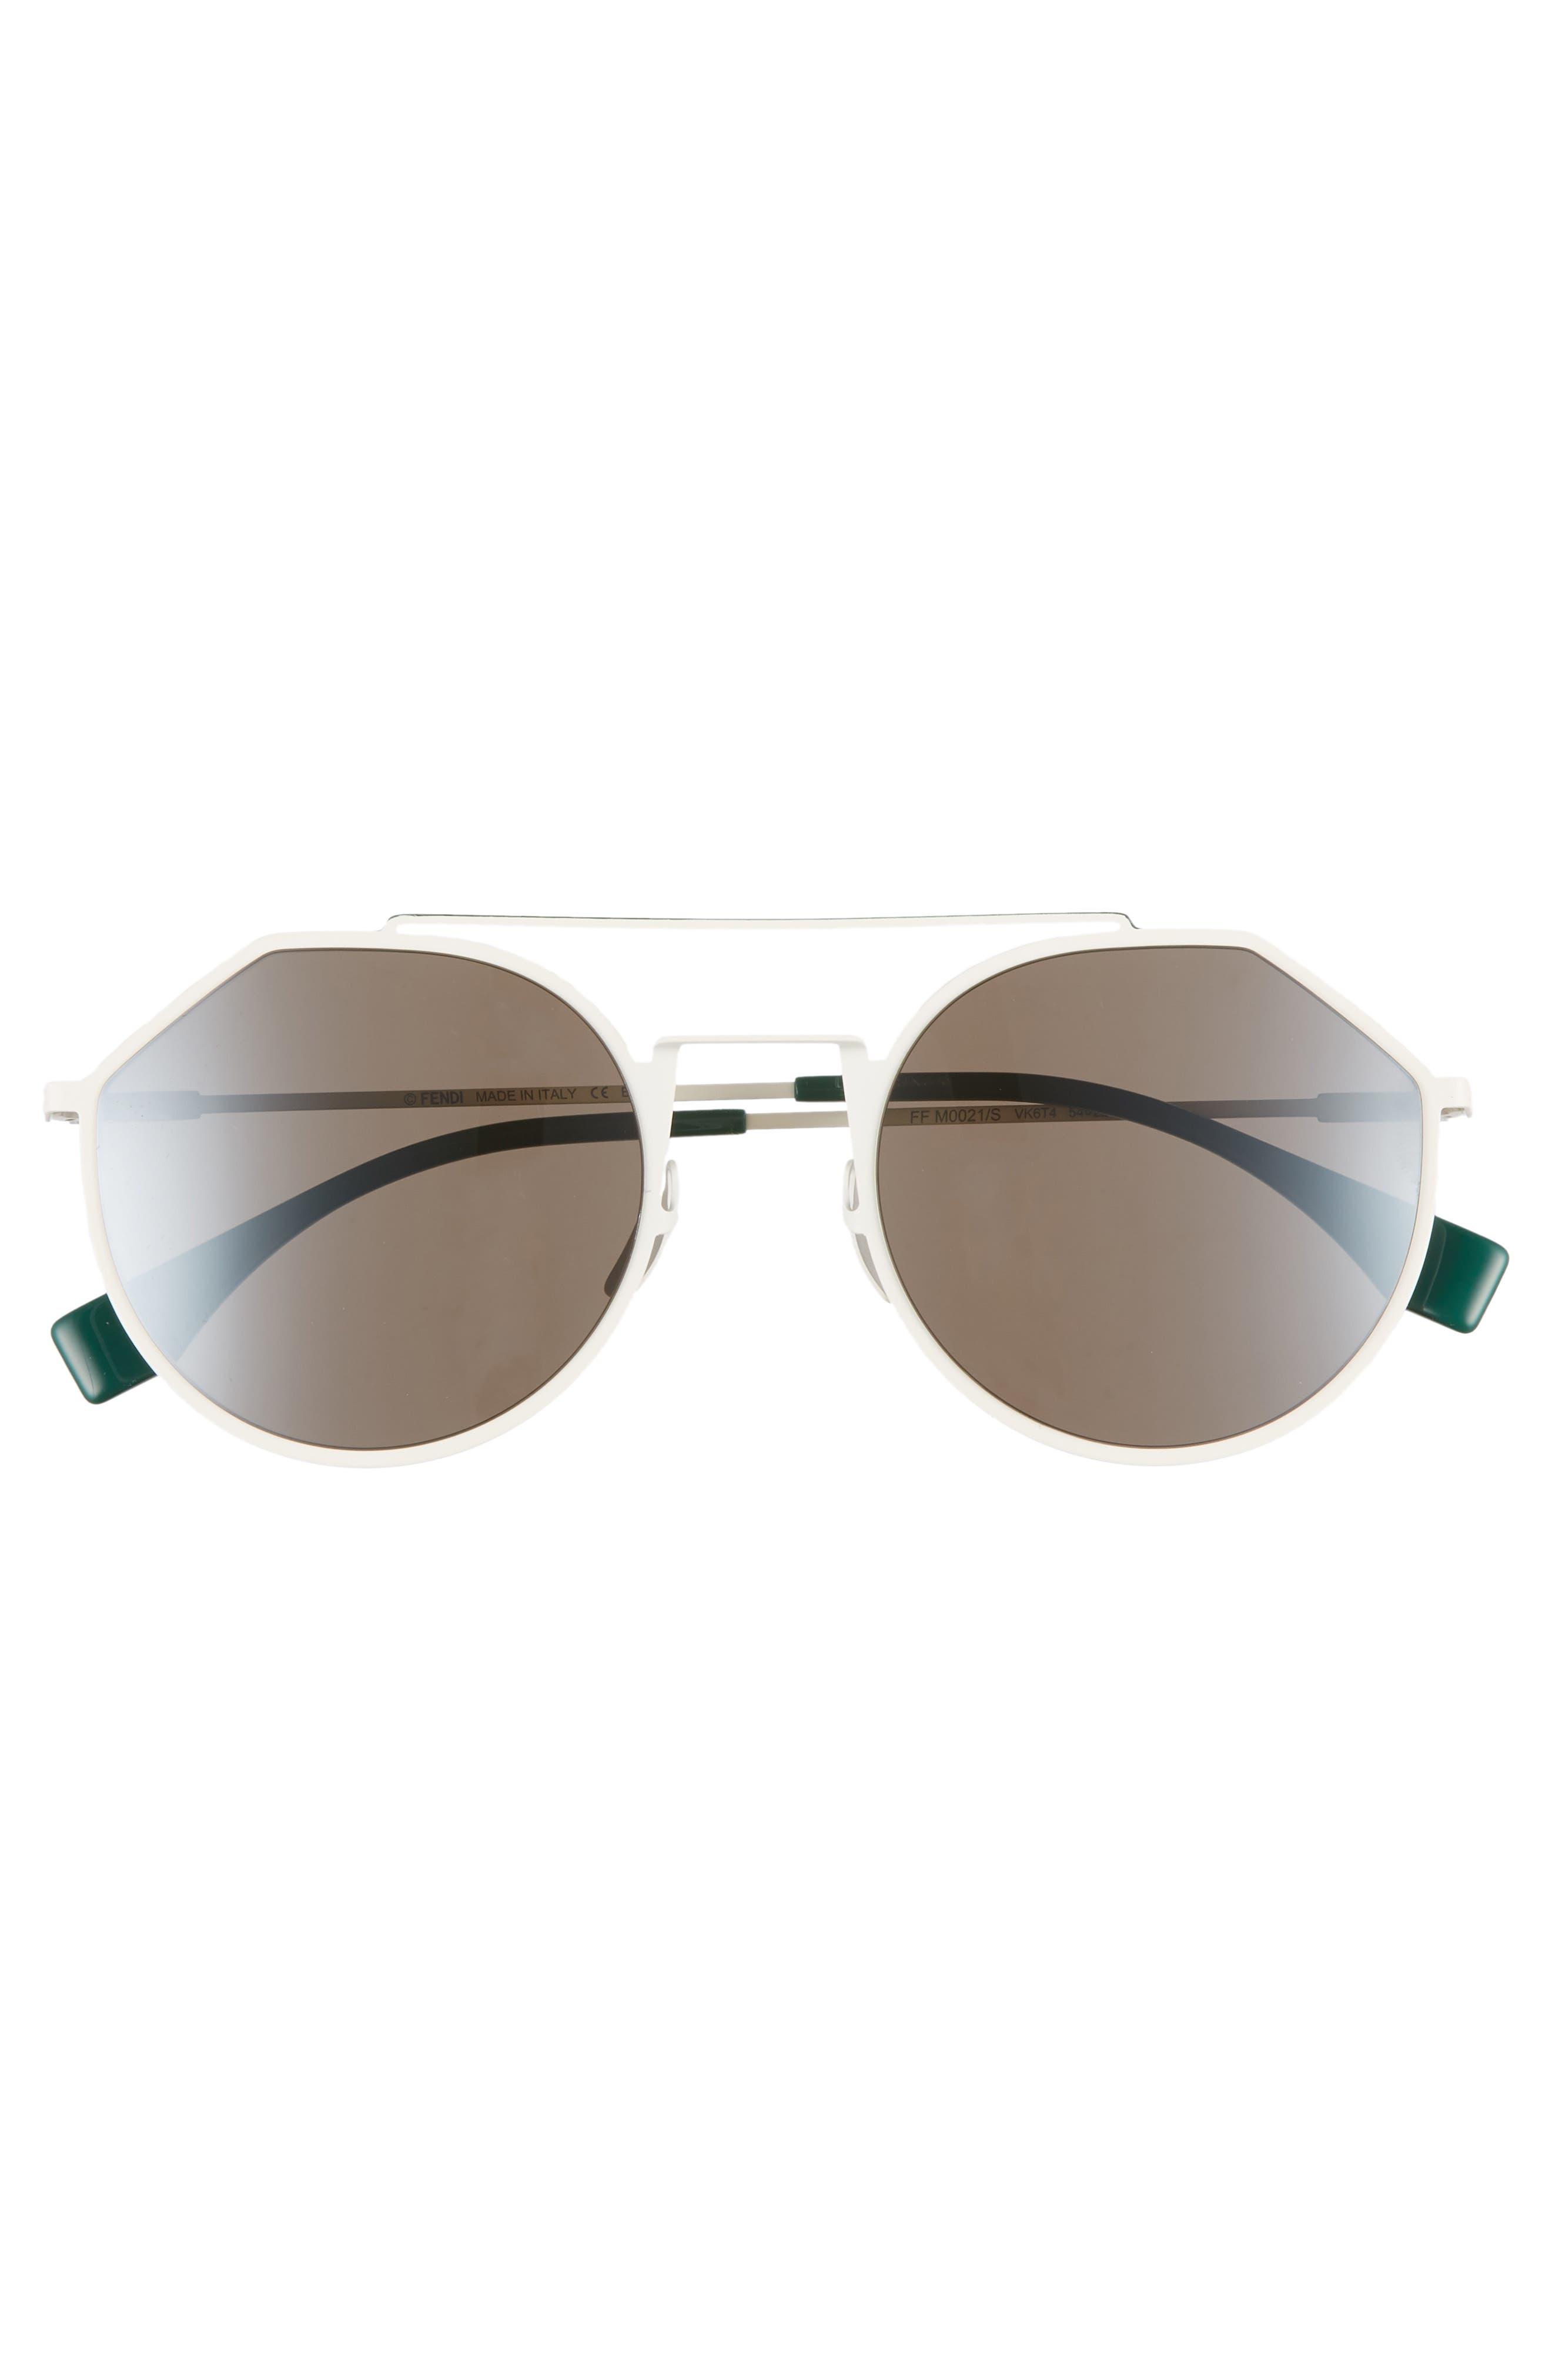 ab3407f6129a Men s Fendi Sunglasses   Eyeglasses